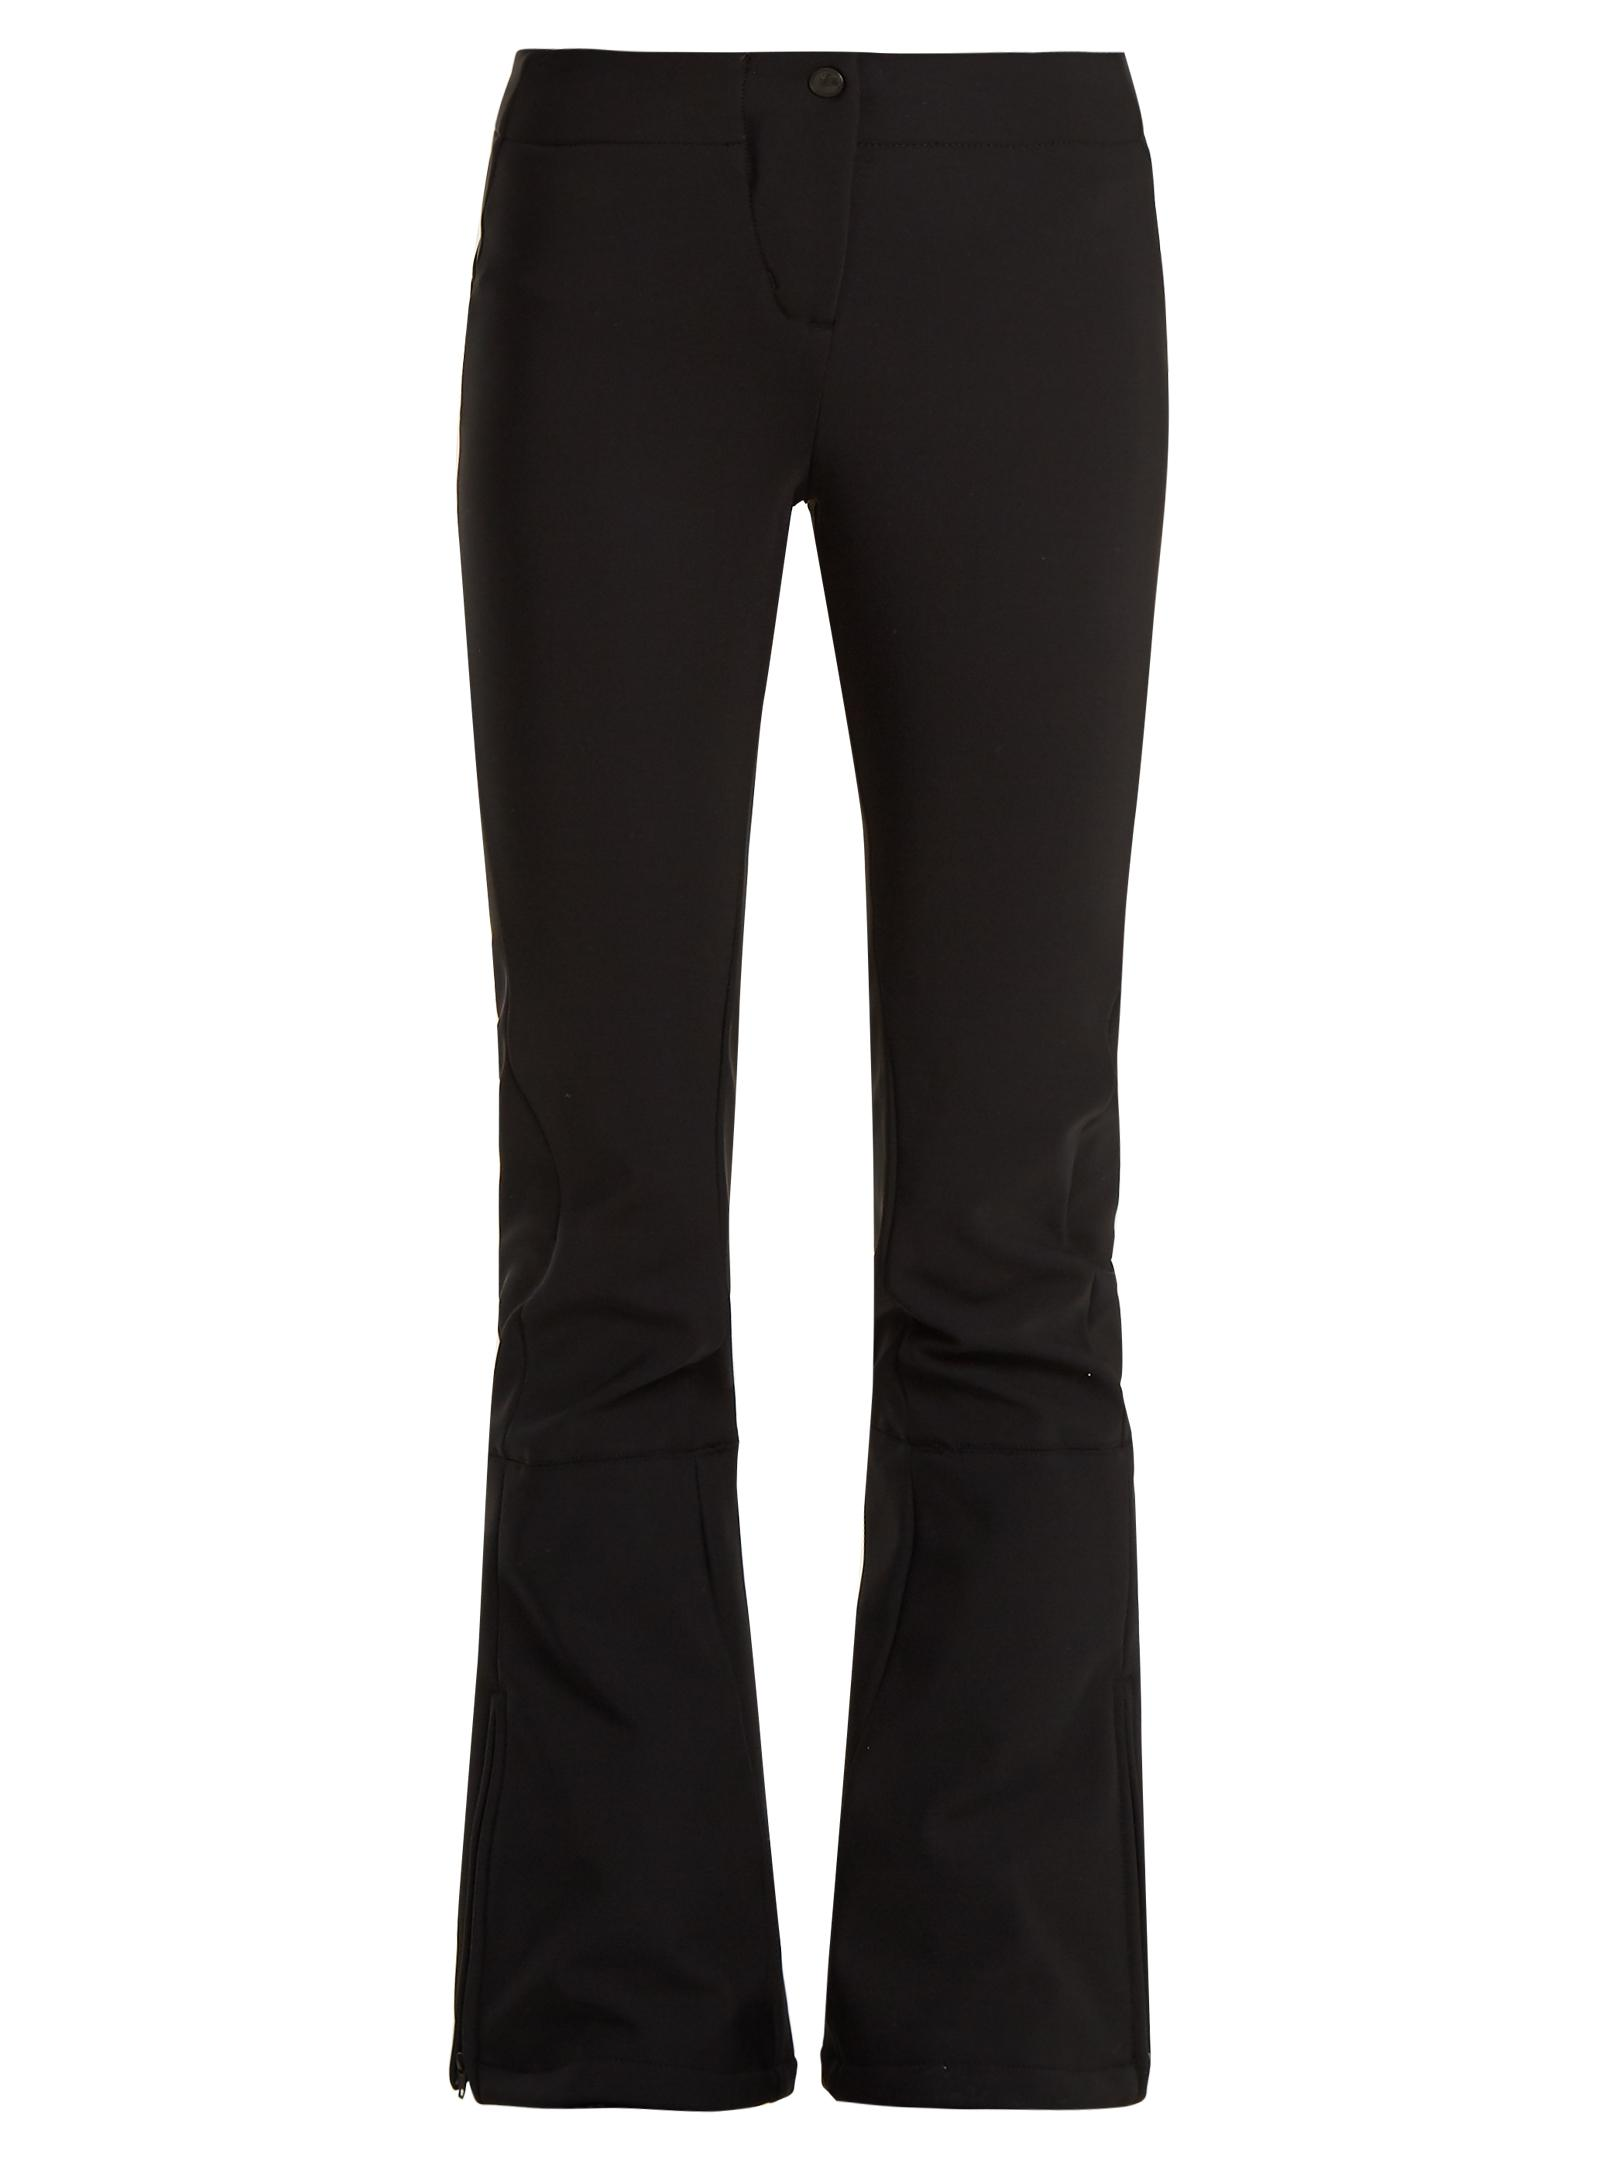 Fusalp Tipi Ii Kick flare Ski Trousers in Black Lyst